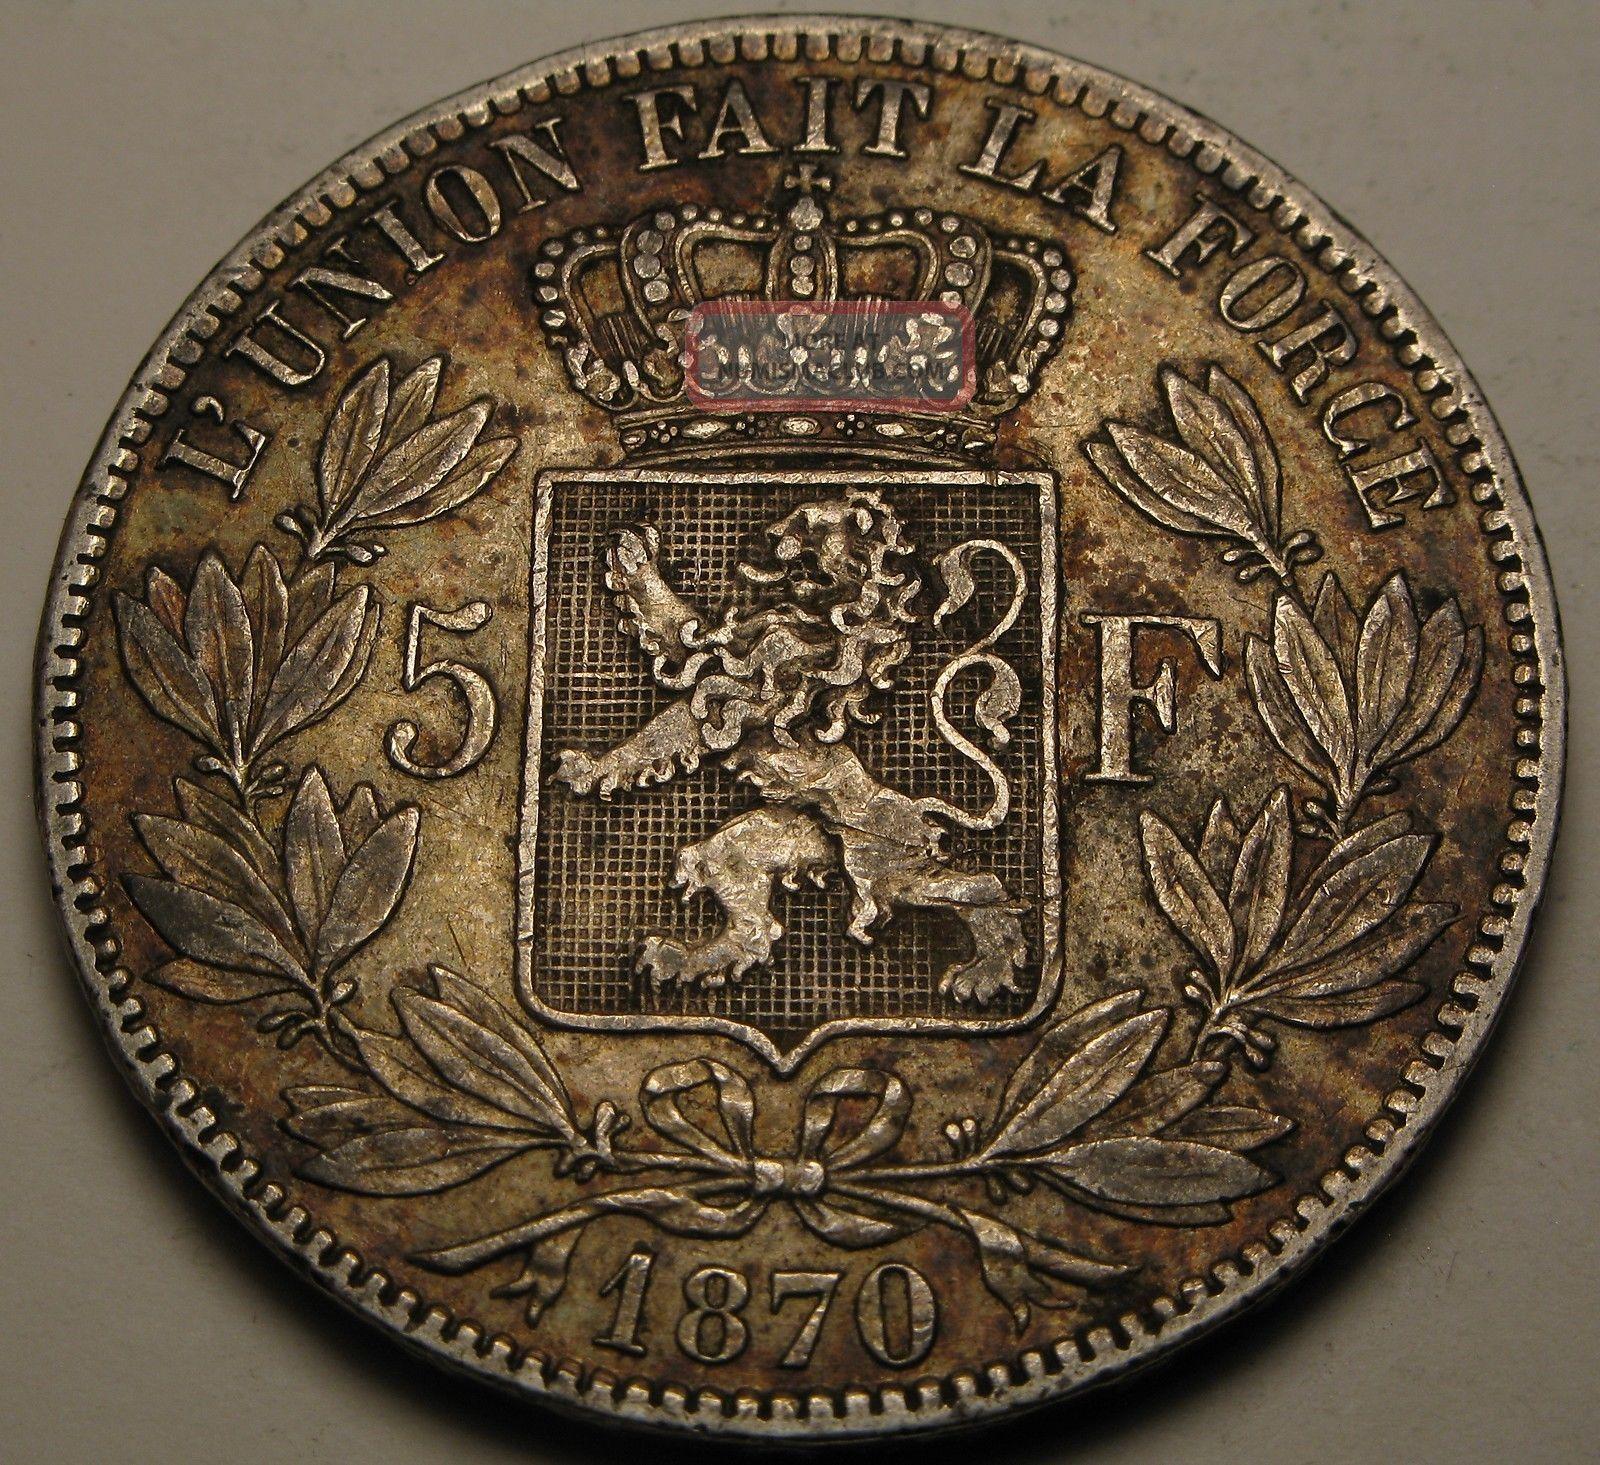 Belgium 5 Francs 1870 - Silver - Leopold Ii.  - Vf 1616 Europe photo